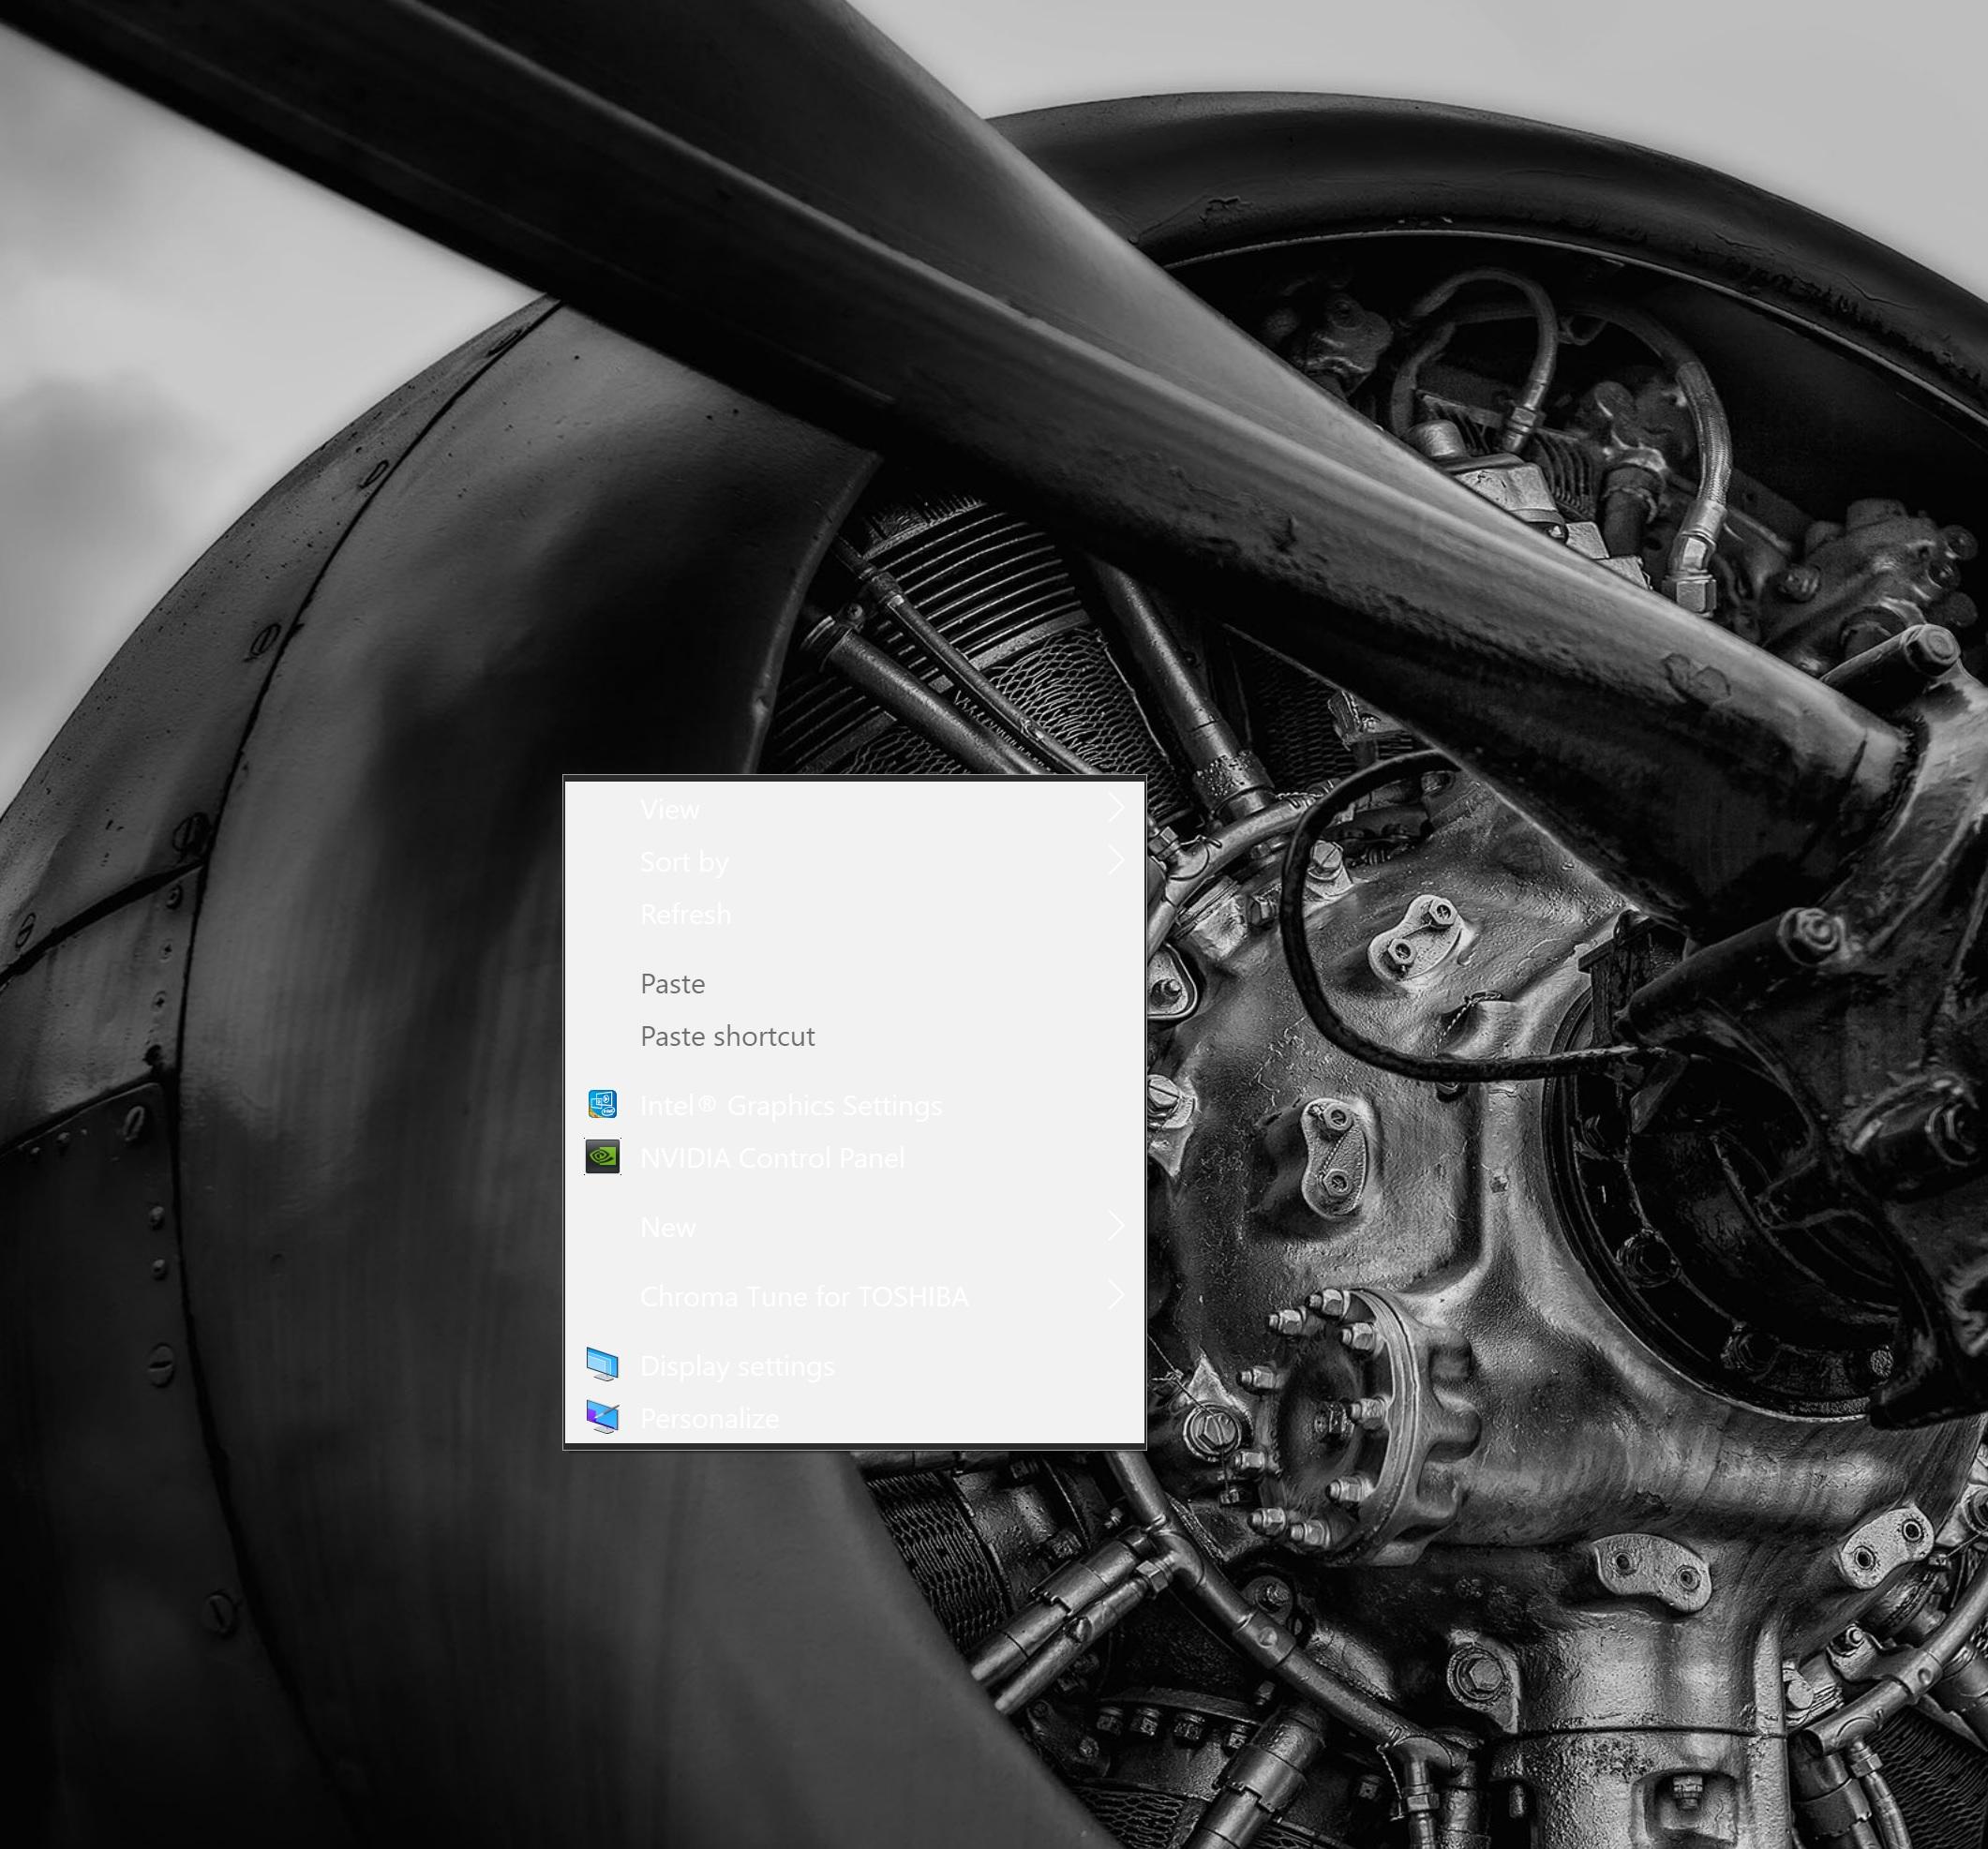 1809 Menu windows 10 1809 dark mode (solved) - microsoft community